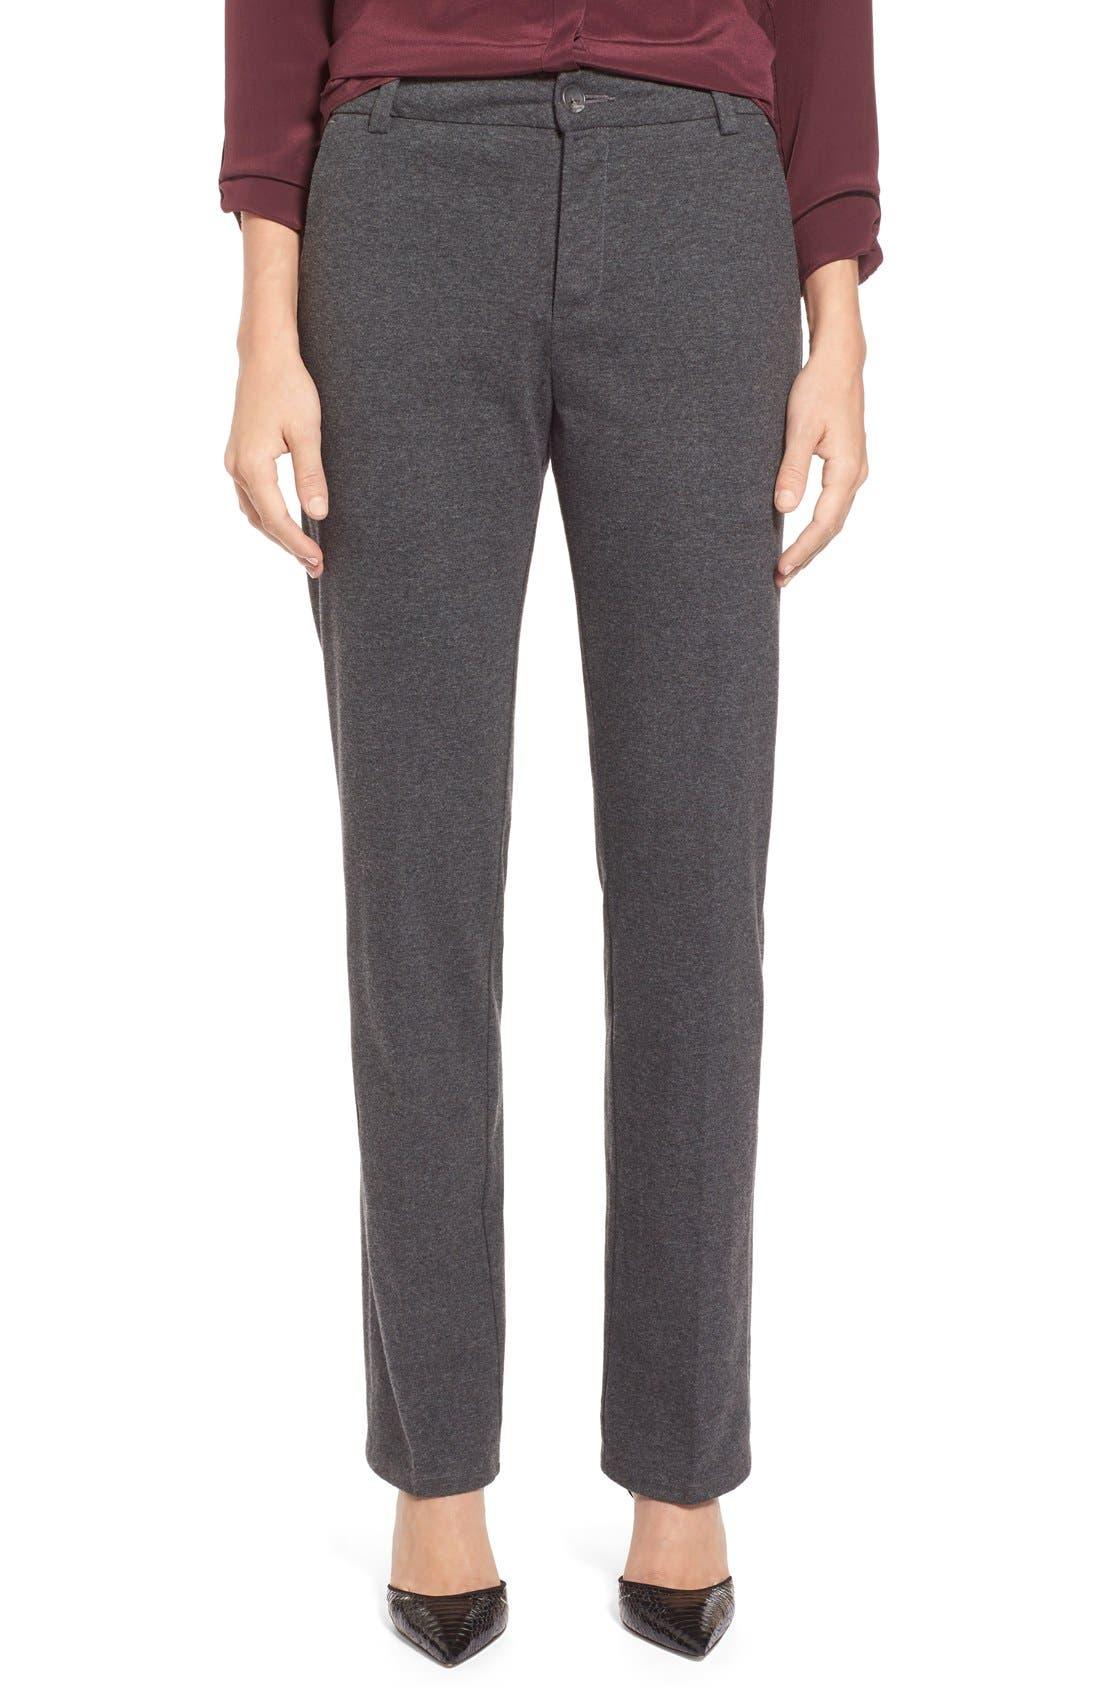 Cotton Jersey Trousers,                             Main thumbnail 1, color,                             069